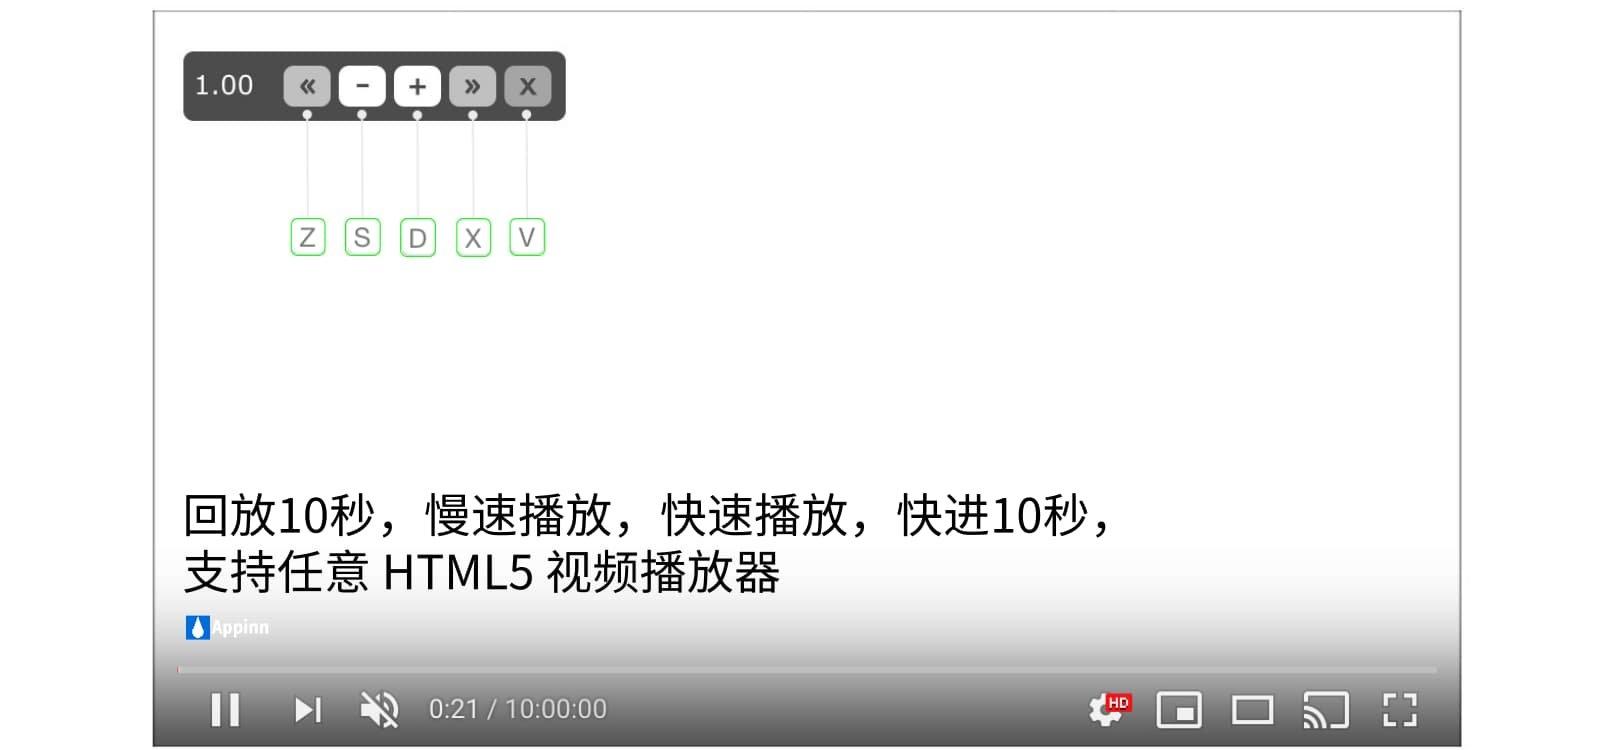 [Chrome/Firefox插件] 为网页视频添加倍速、快进、回放功能